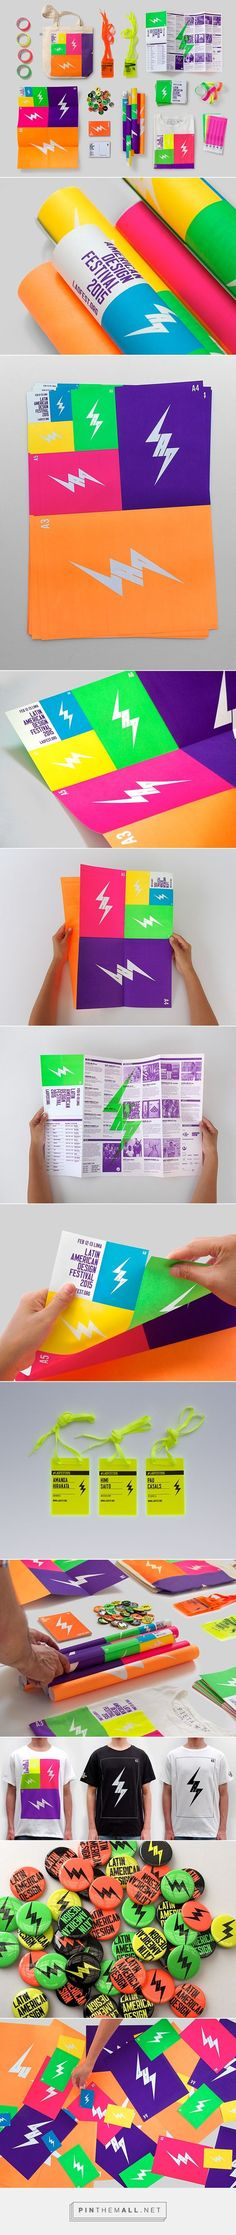 Latin American Design Festival Branding on Behance | Fivestar Branding – Design and Branding Agency & Inspiration Gallery